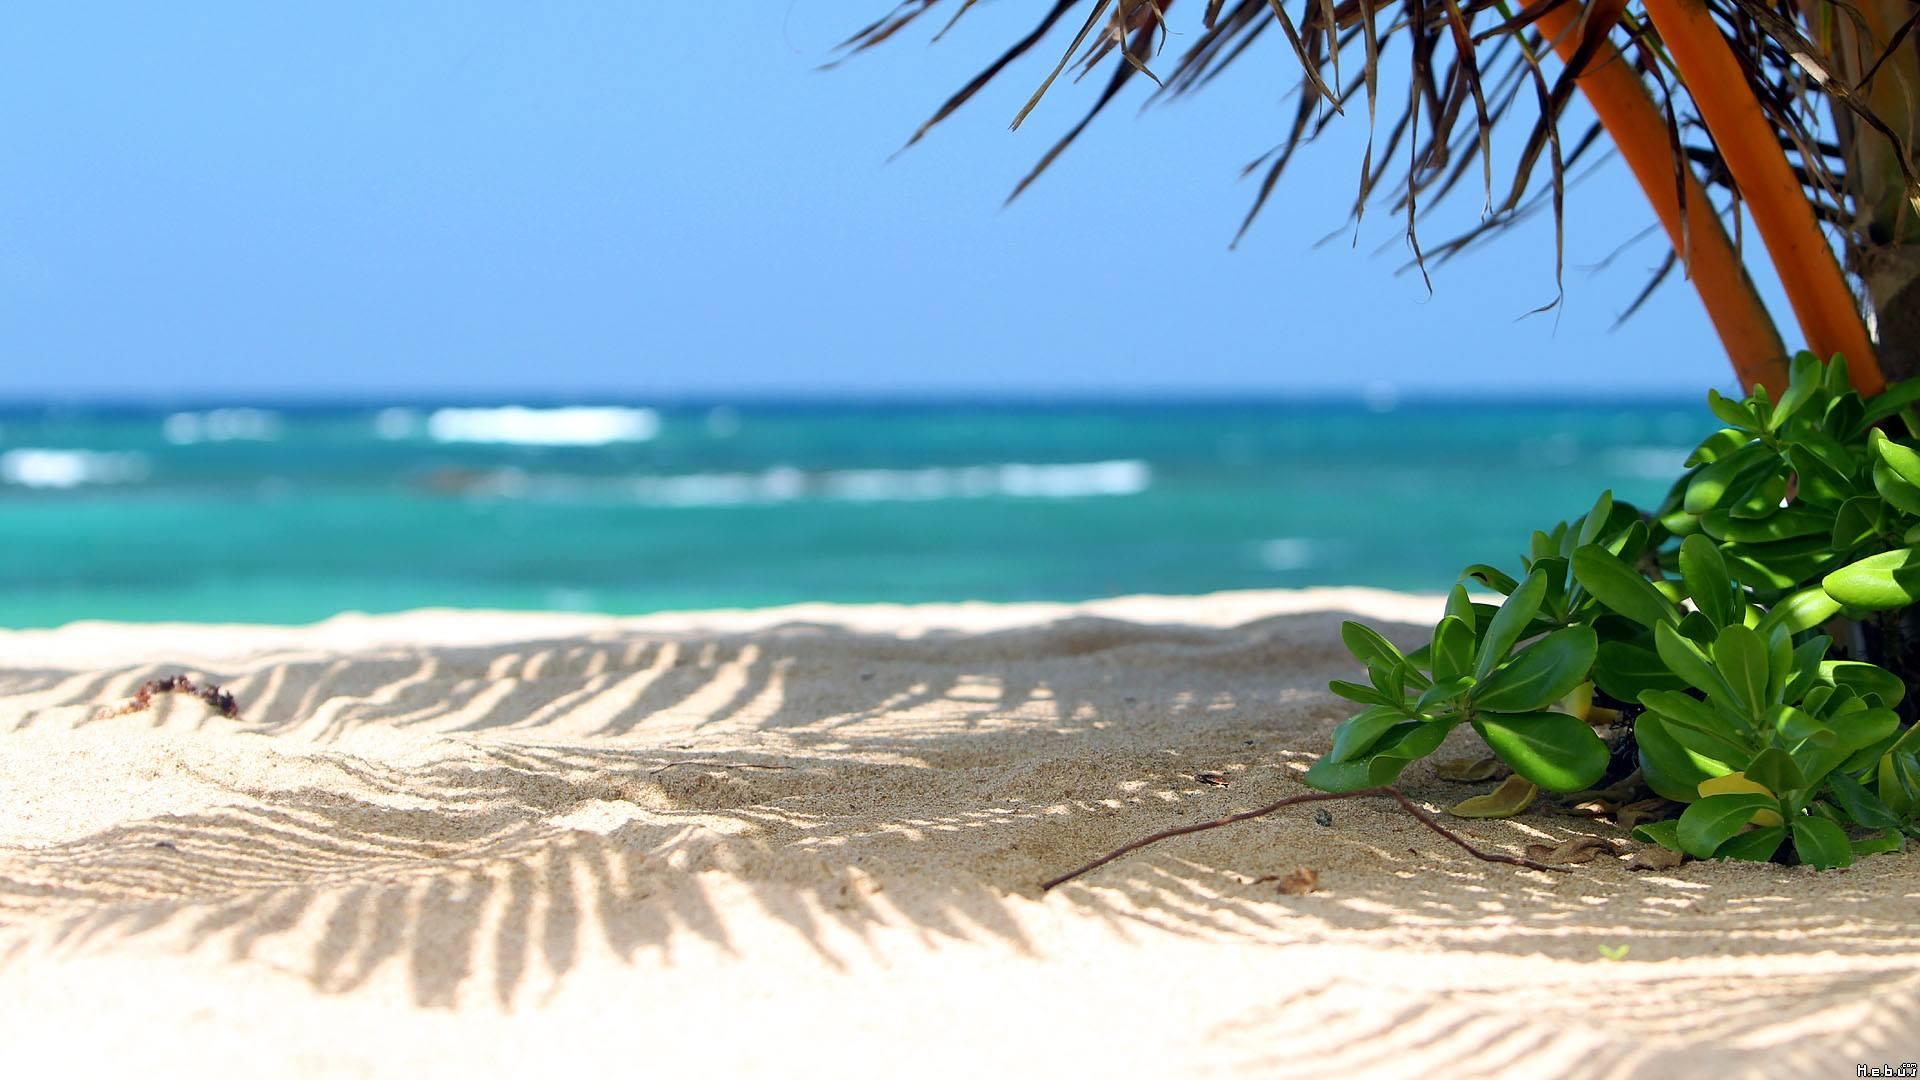 Beautiful Beach Vacation Rentals 1920x1080